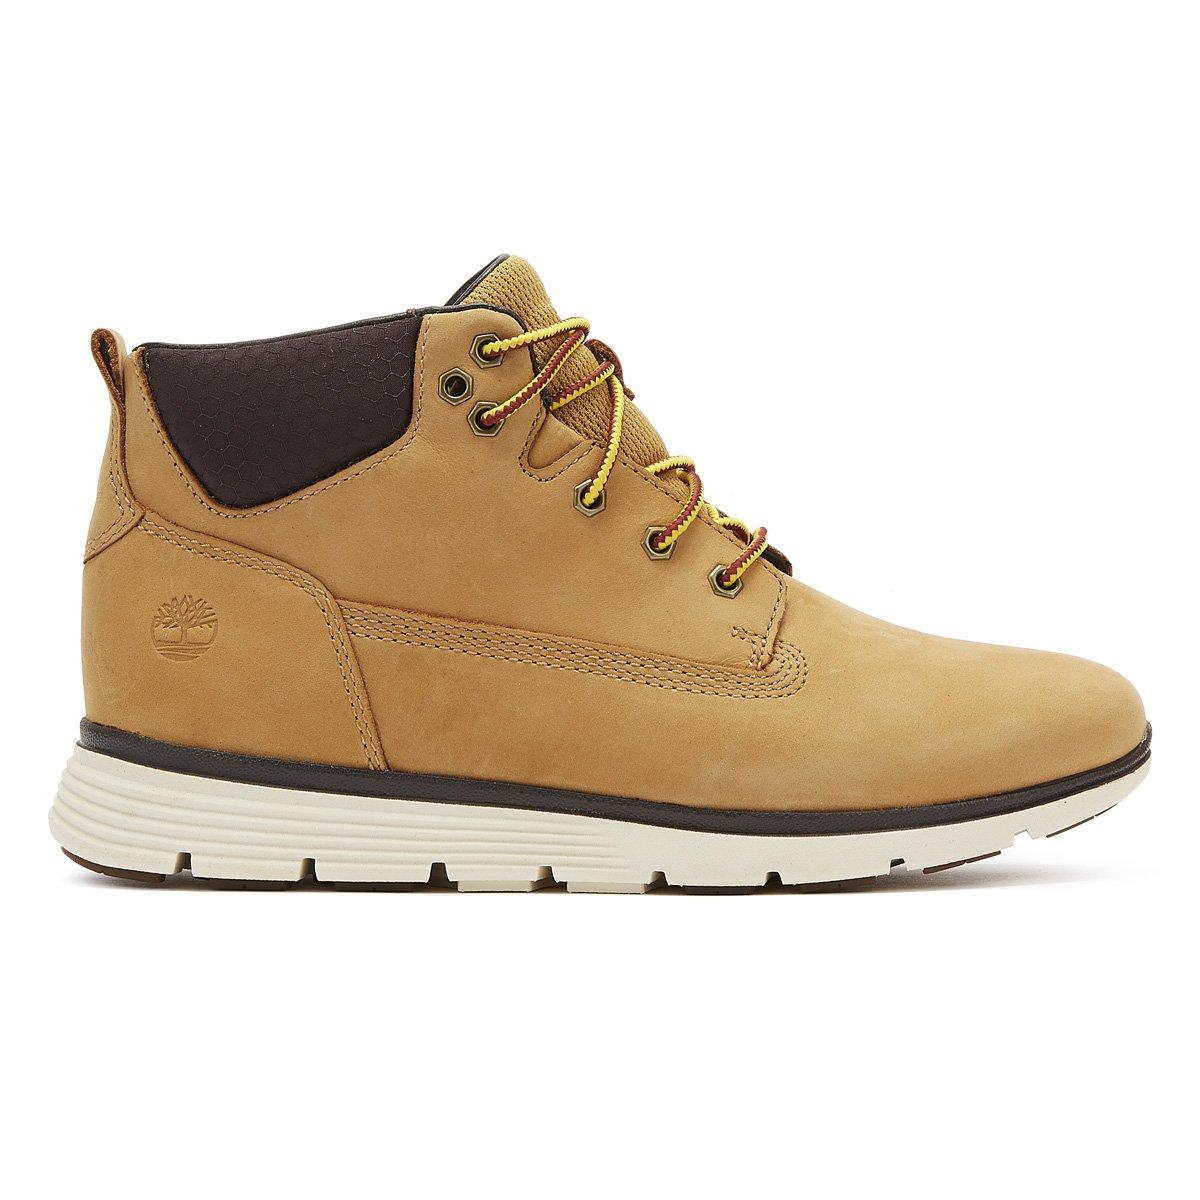 Details about Timberland Killington Junior Chukka Wheat Boots Kids Winter Shoes